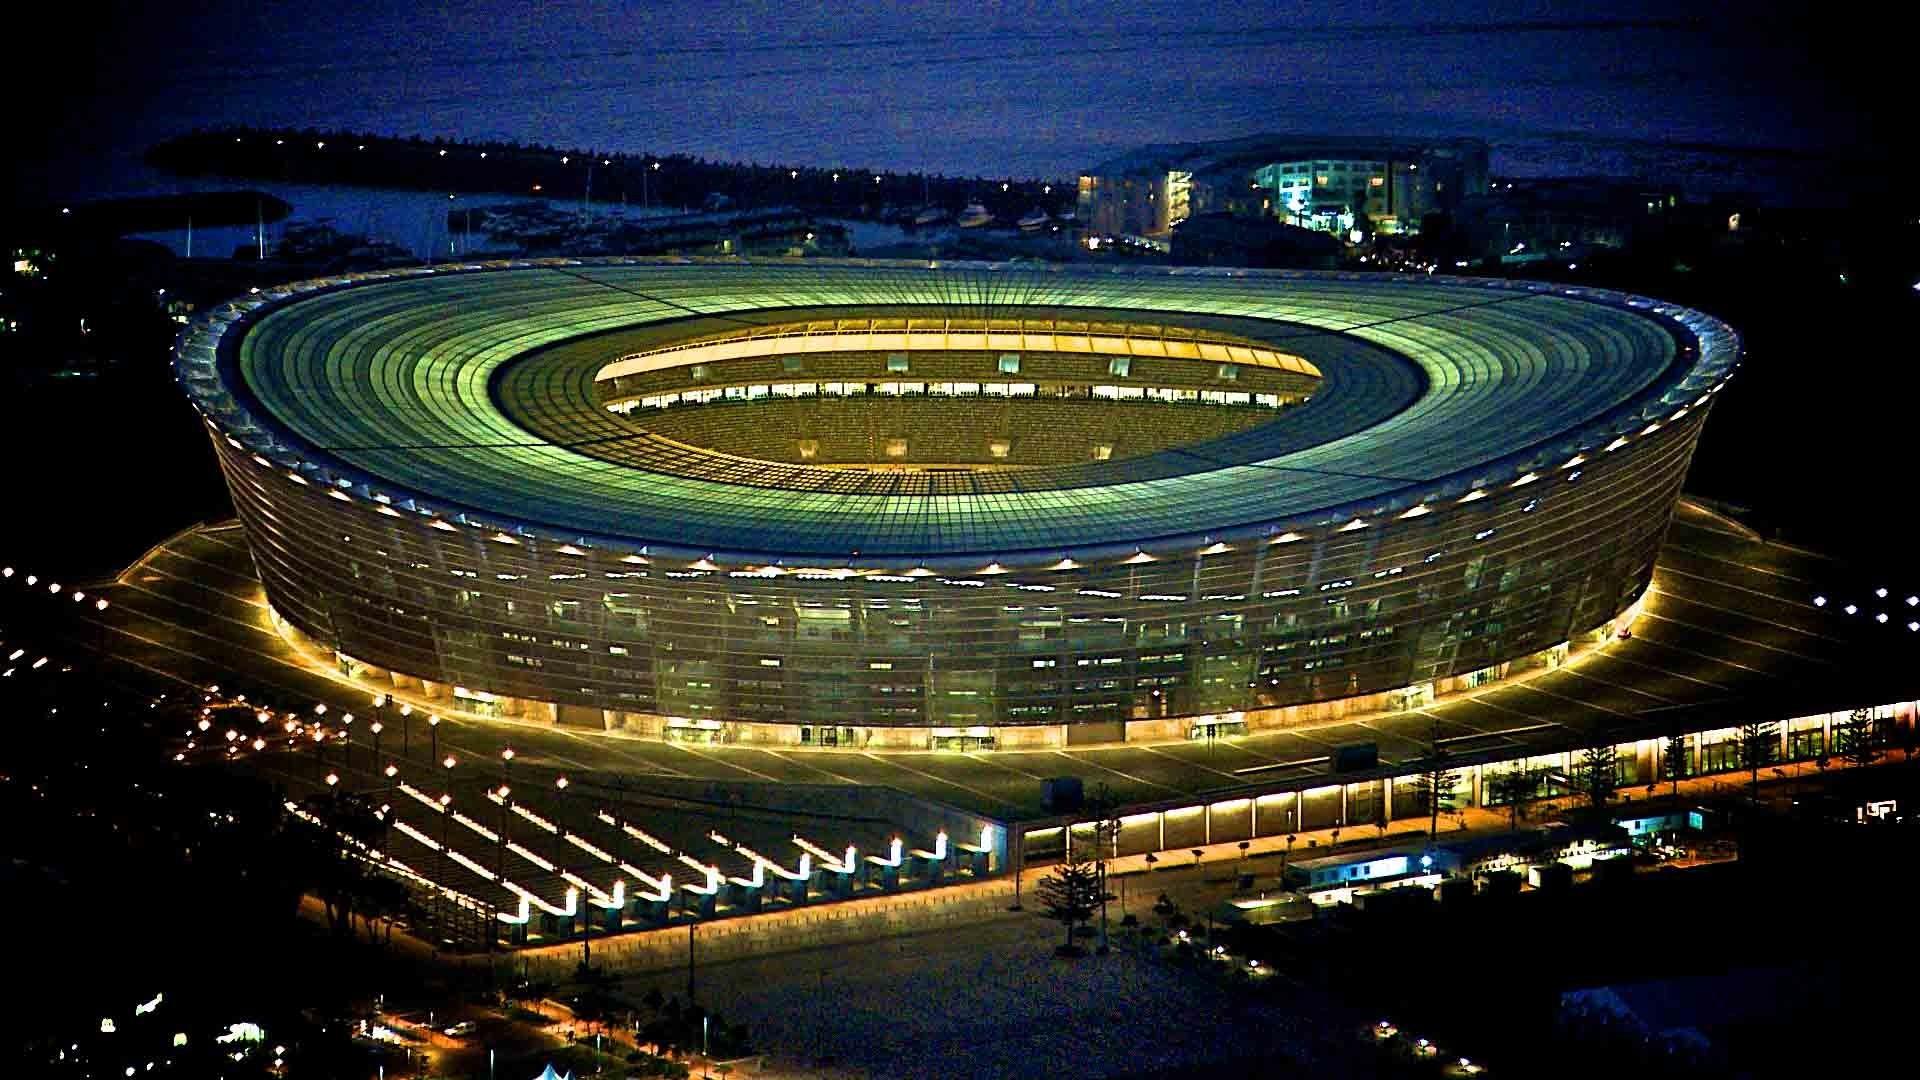 Res: 1920x1080, QE.94 | v.9.7 331.1 kbyte | Football stadium